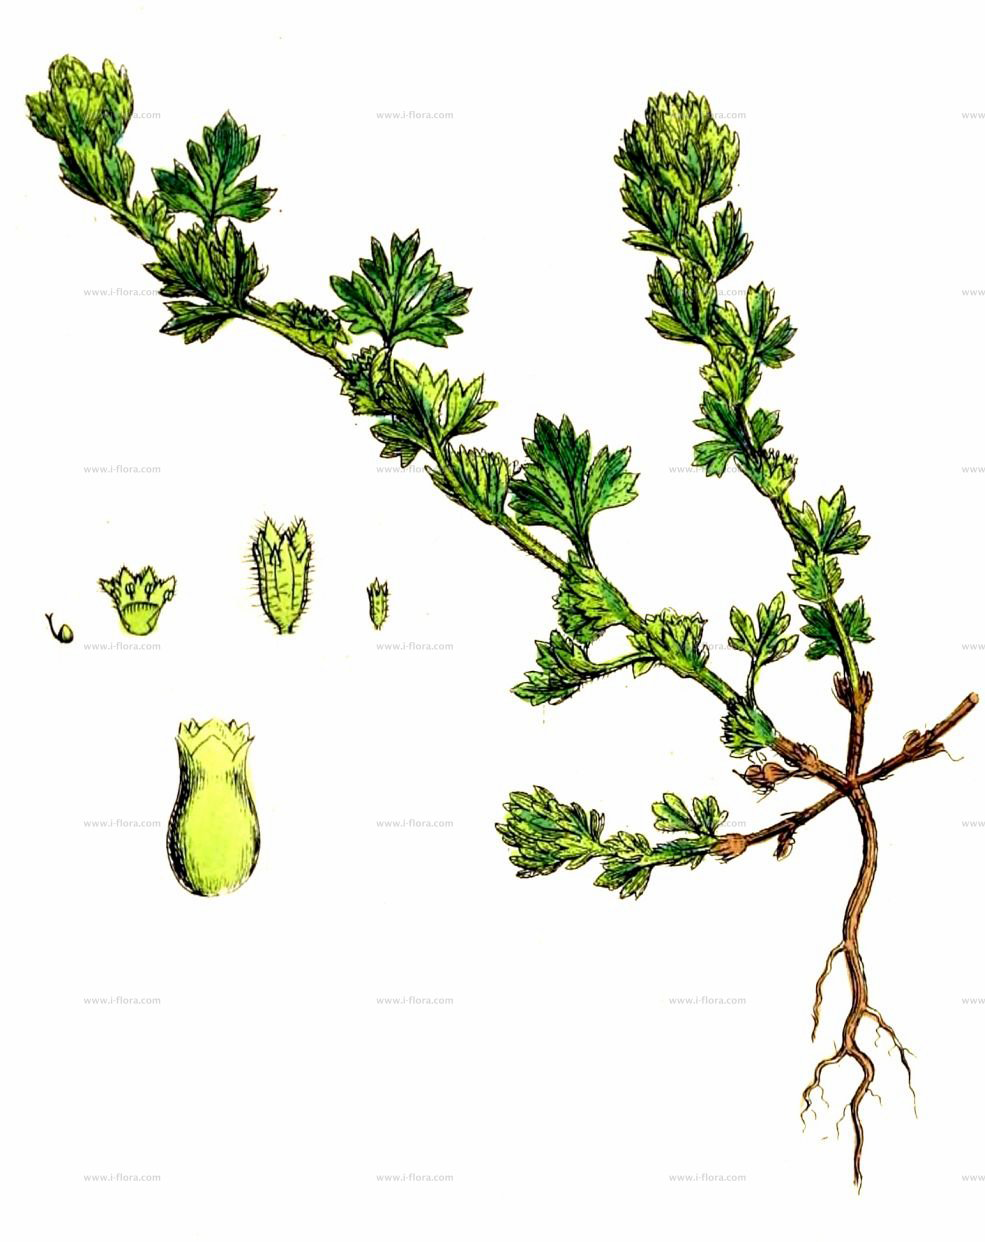 Parsley-piert-plant-Illustration